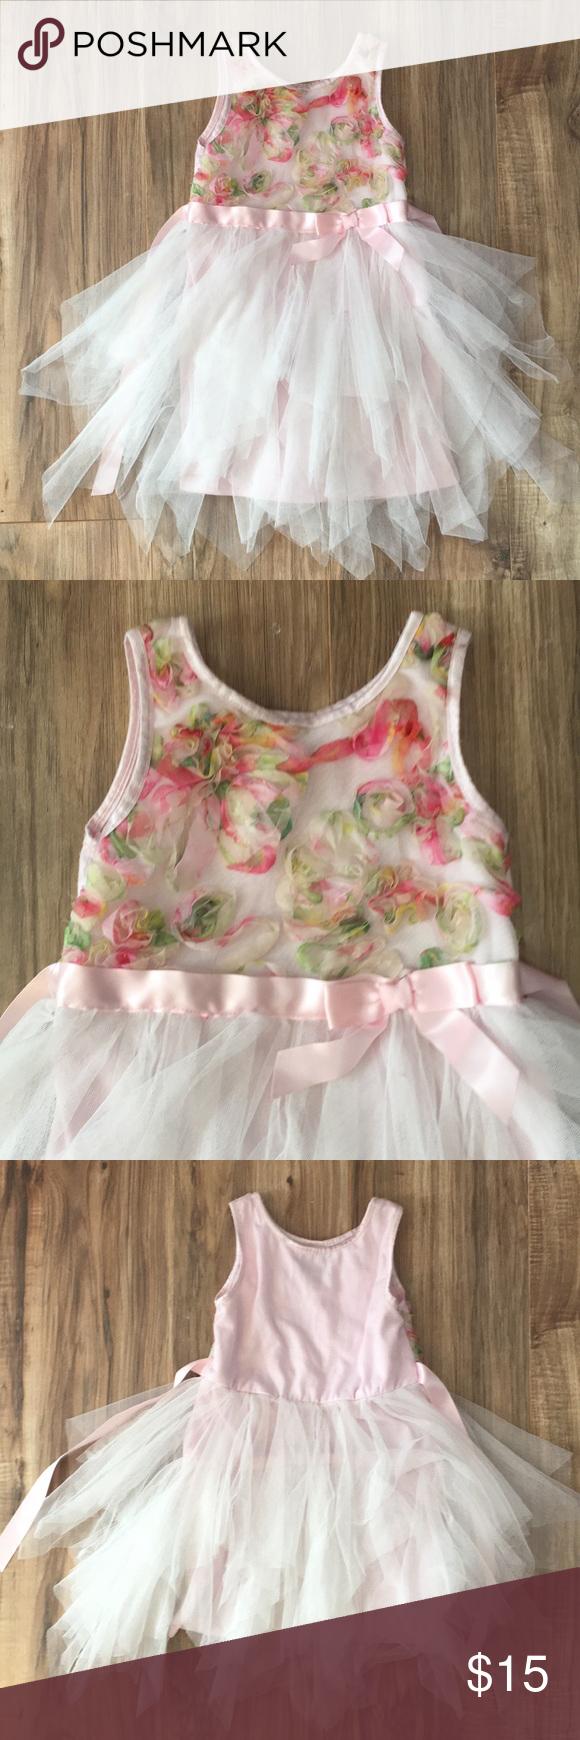 Lilt Pink Dress W Tulle Skirt 4t Pink Dress Dresses Clothes Design [ 1740 x 580 Pixel ]